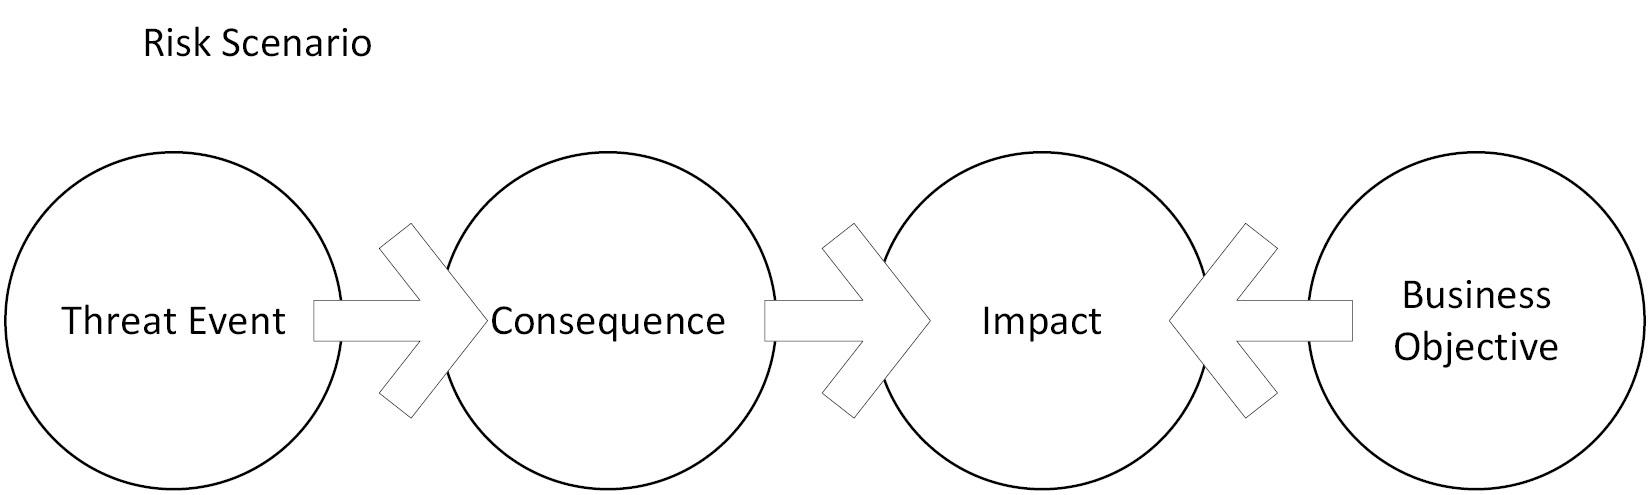 Figure 1.19 – Depiction of a risk scenario